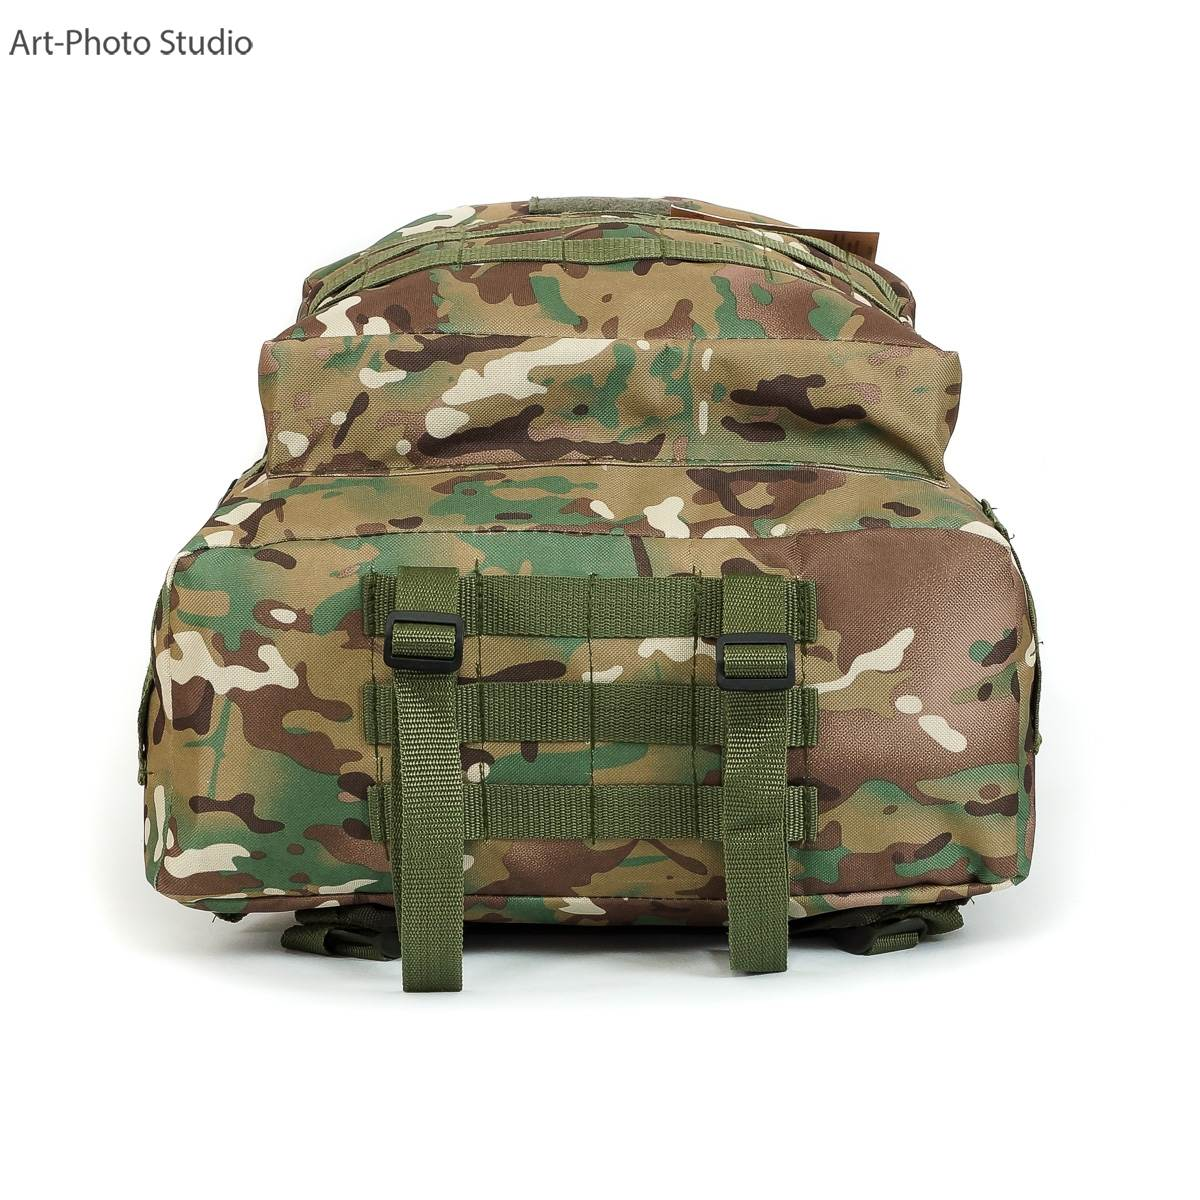 предметная съемка тактических рюкзаков в Харькове